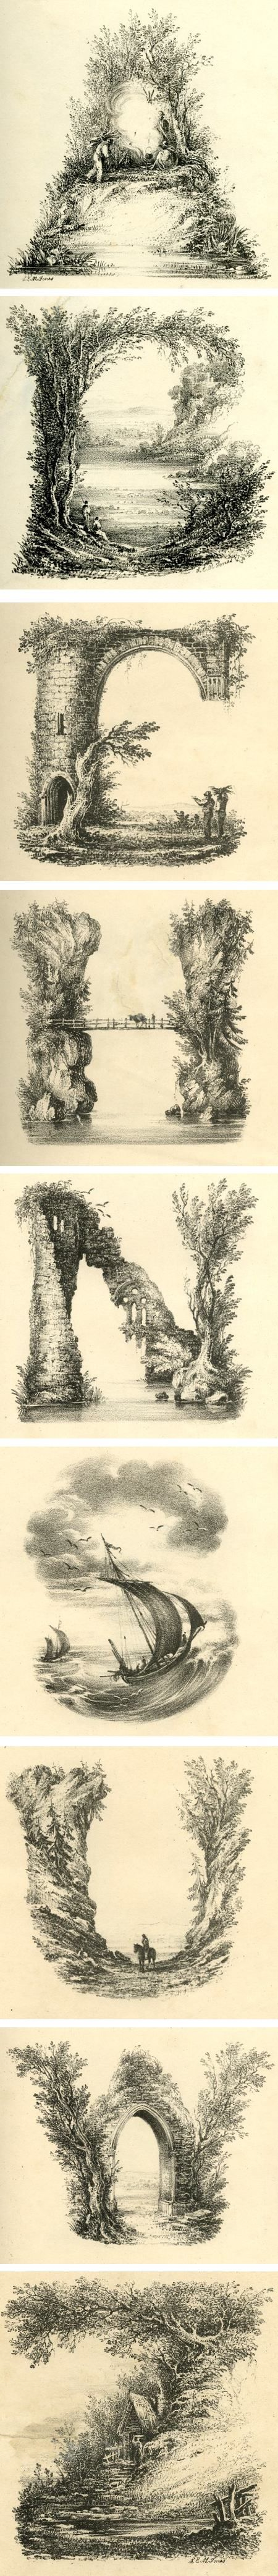 Landscape alphabet, drawn by artist L.E.M. Jones then printed. Early XIXth century.